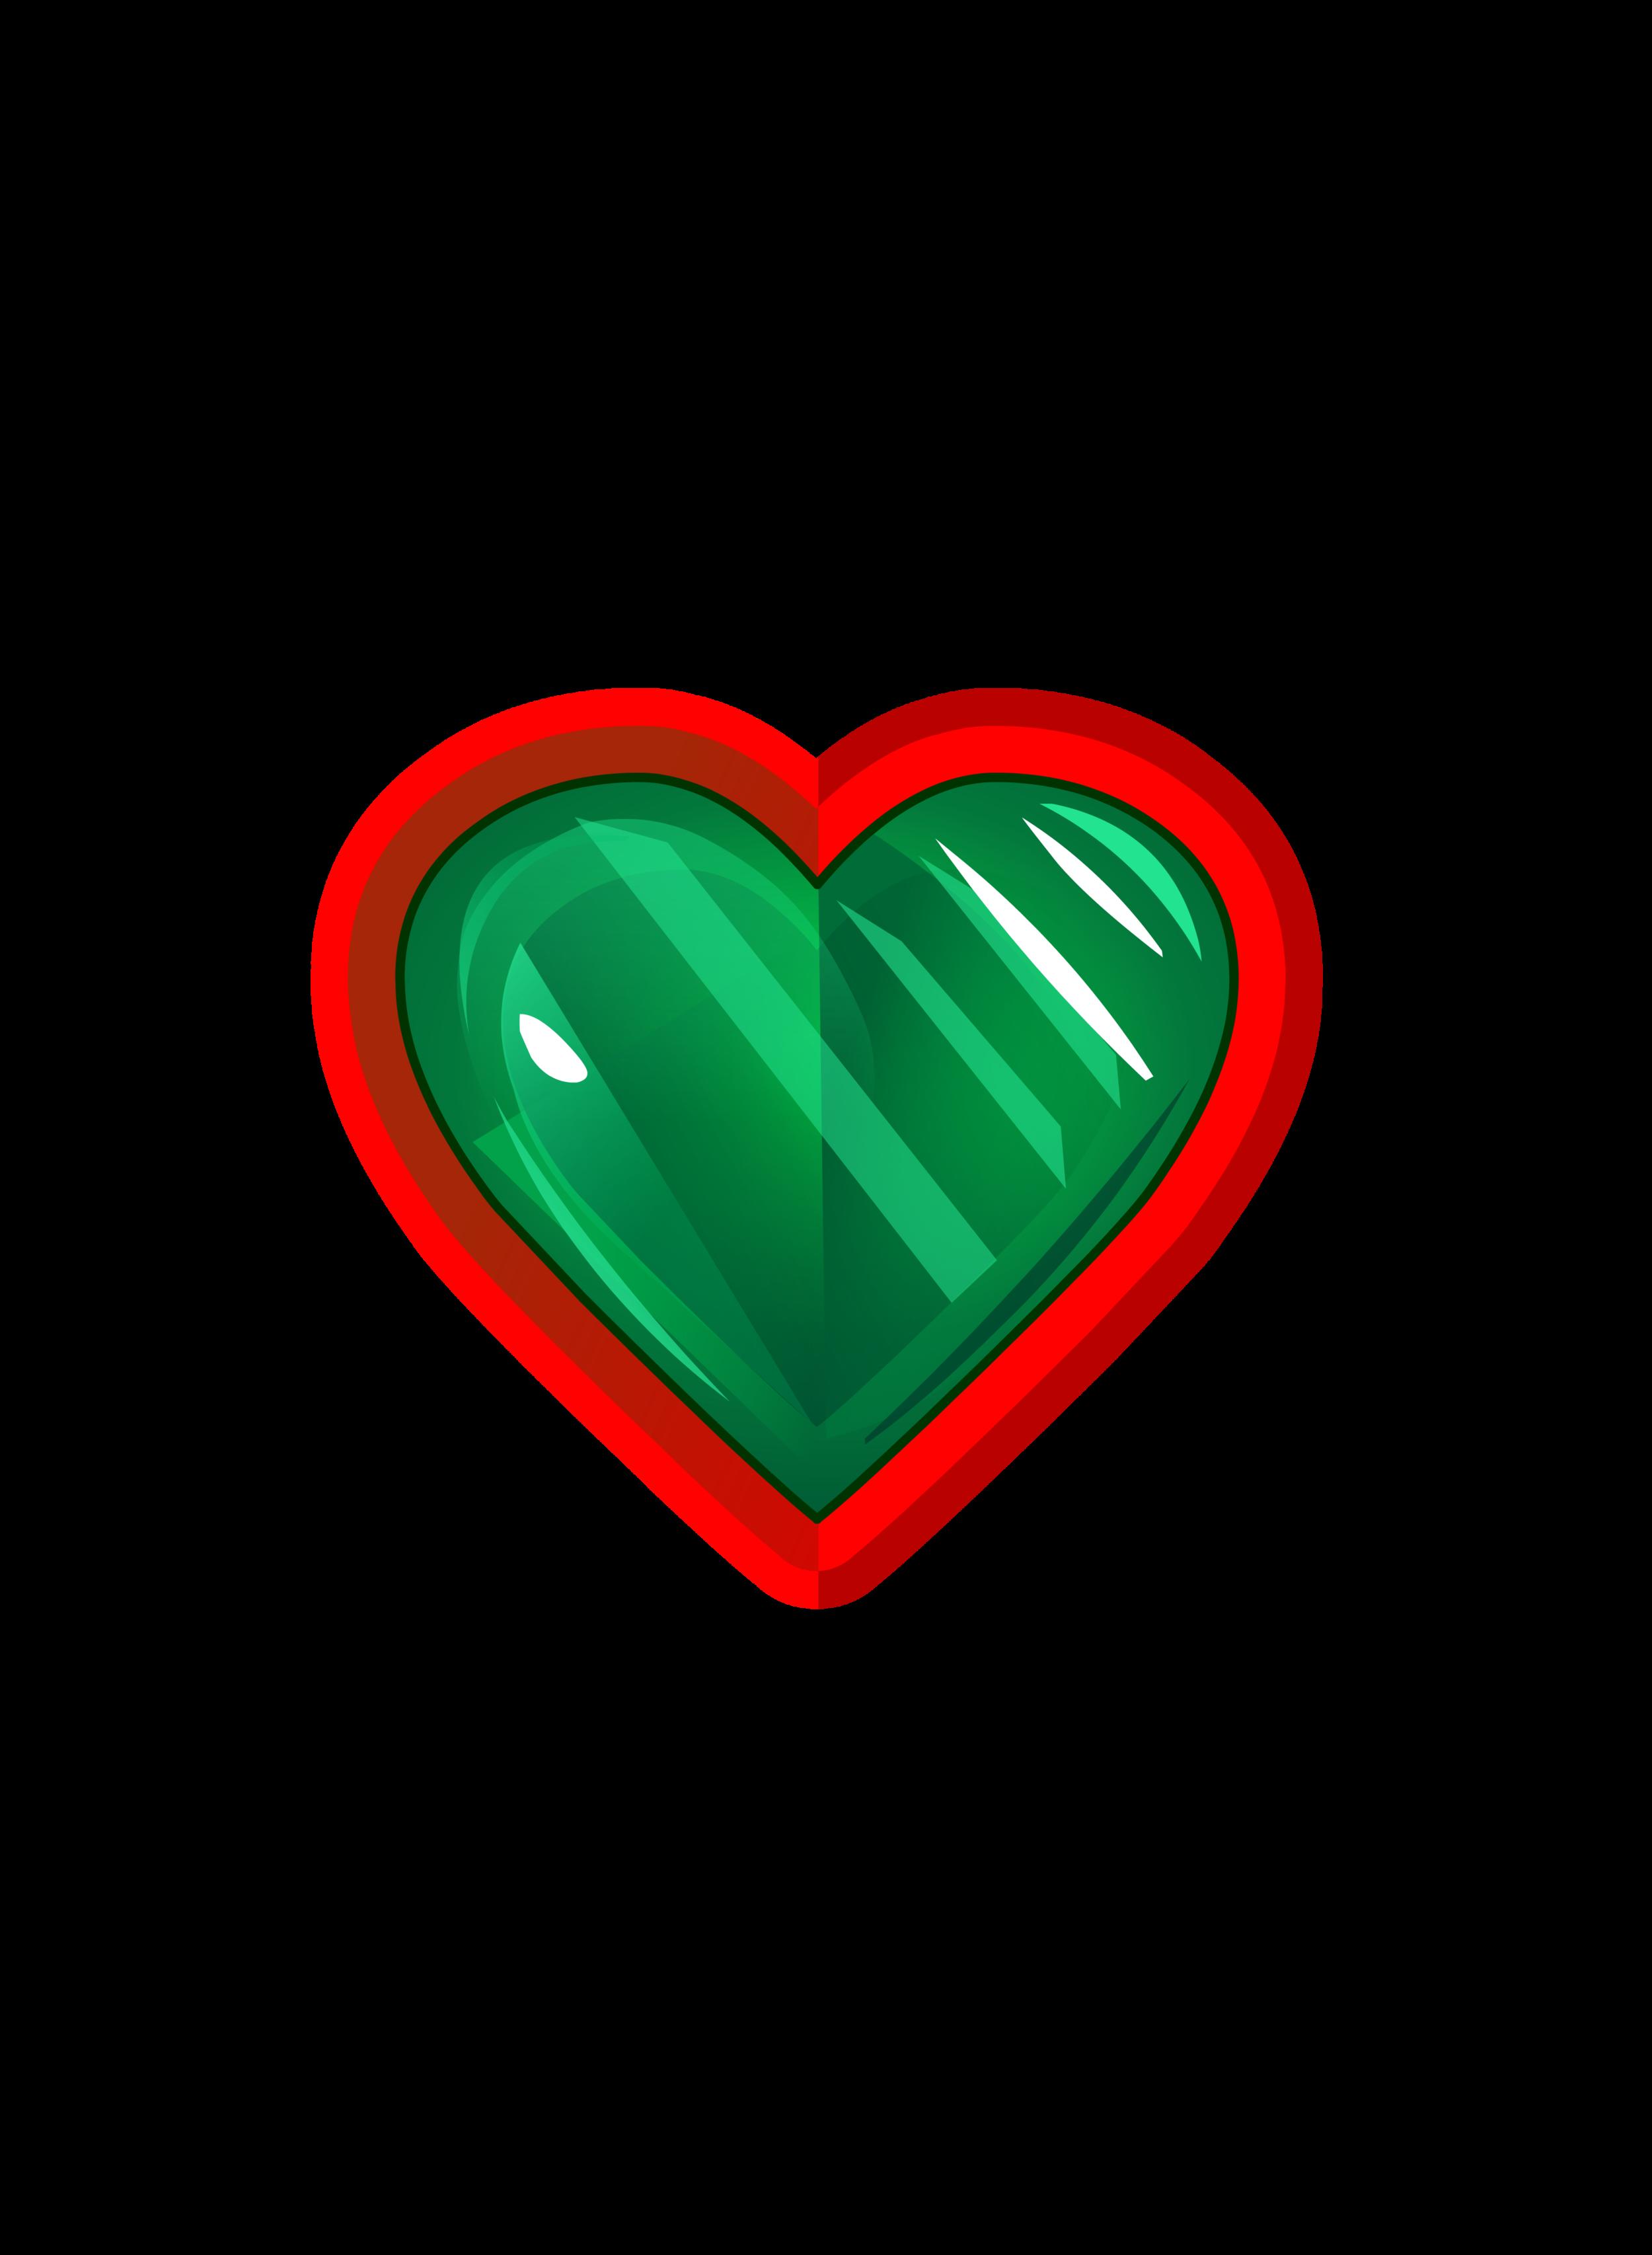 Hearts0014.png